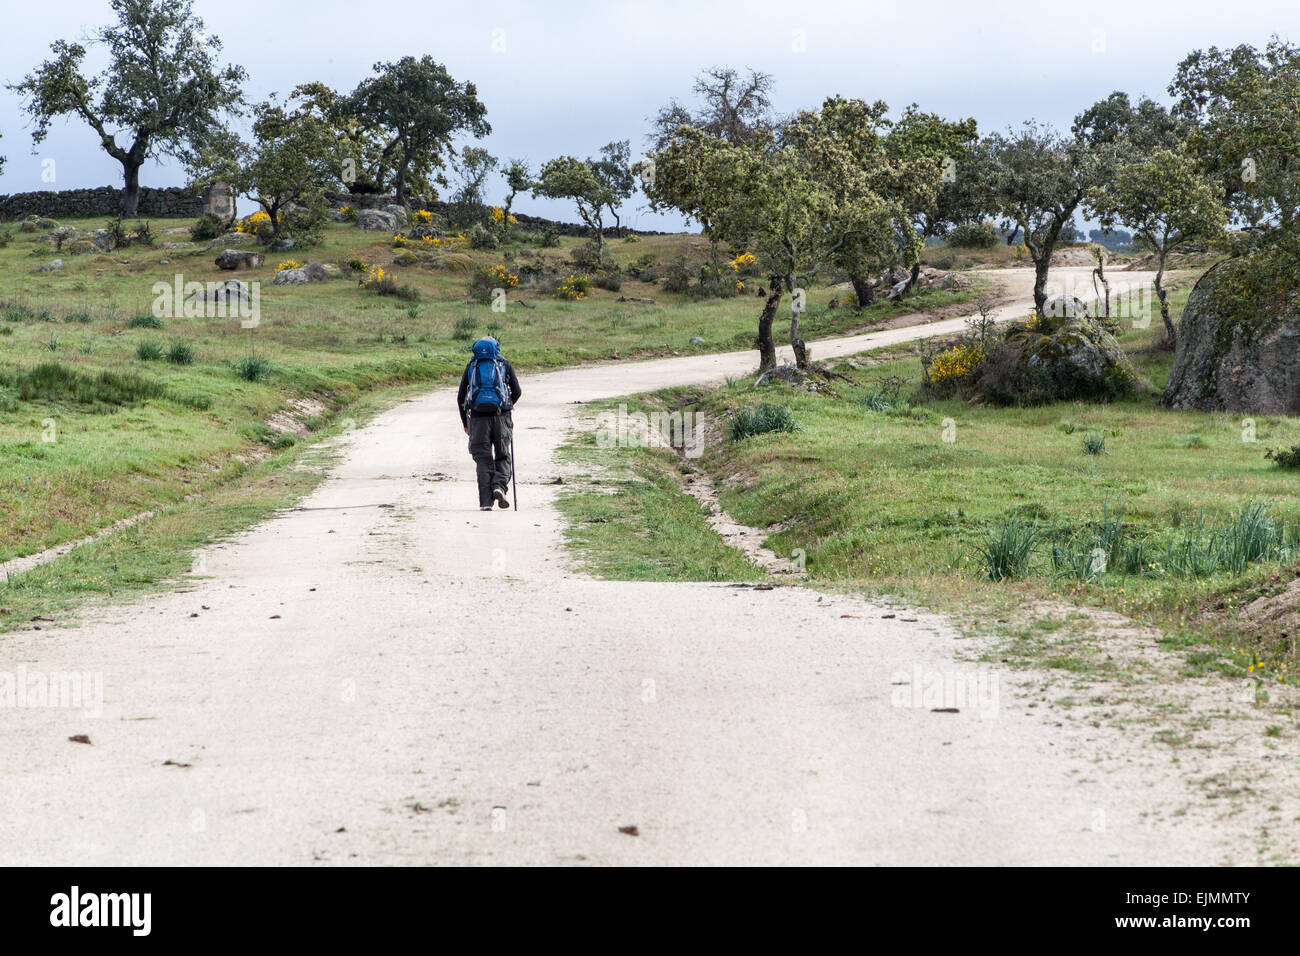 Pilgrim walking the Camino to Santiago de Compostela, traveling across rural Spain along the back roads and dirt - Stock Image